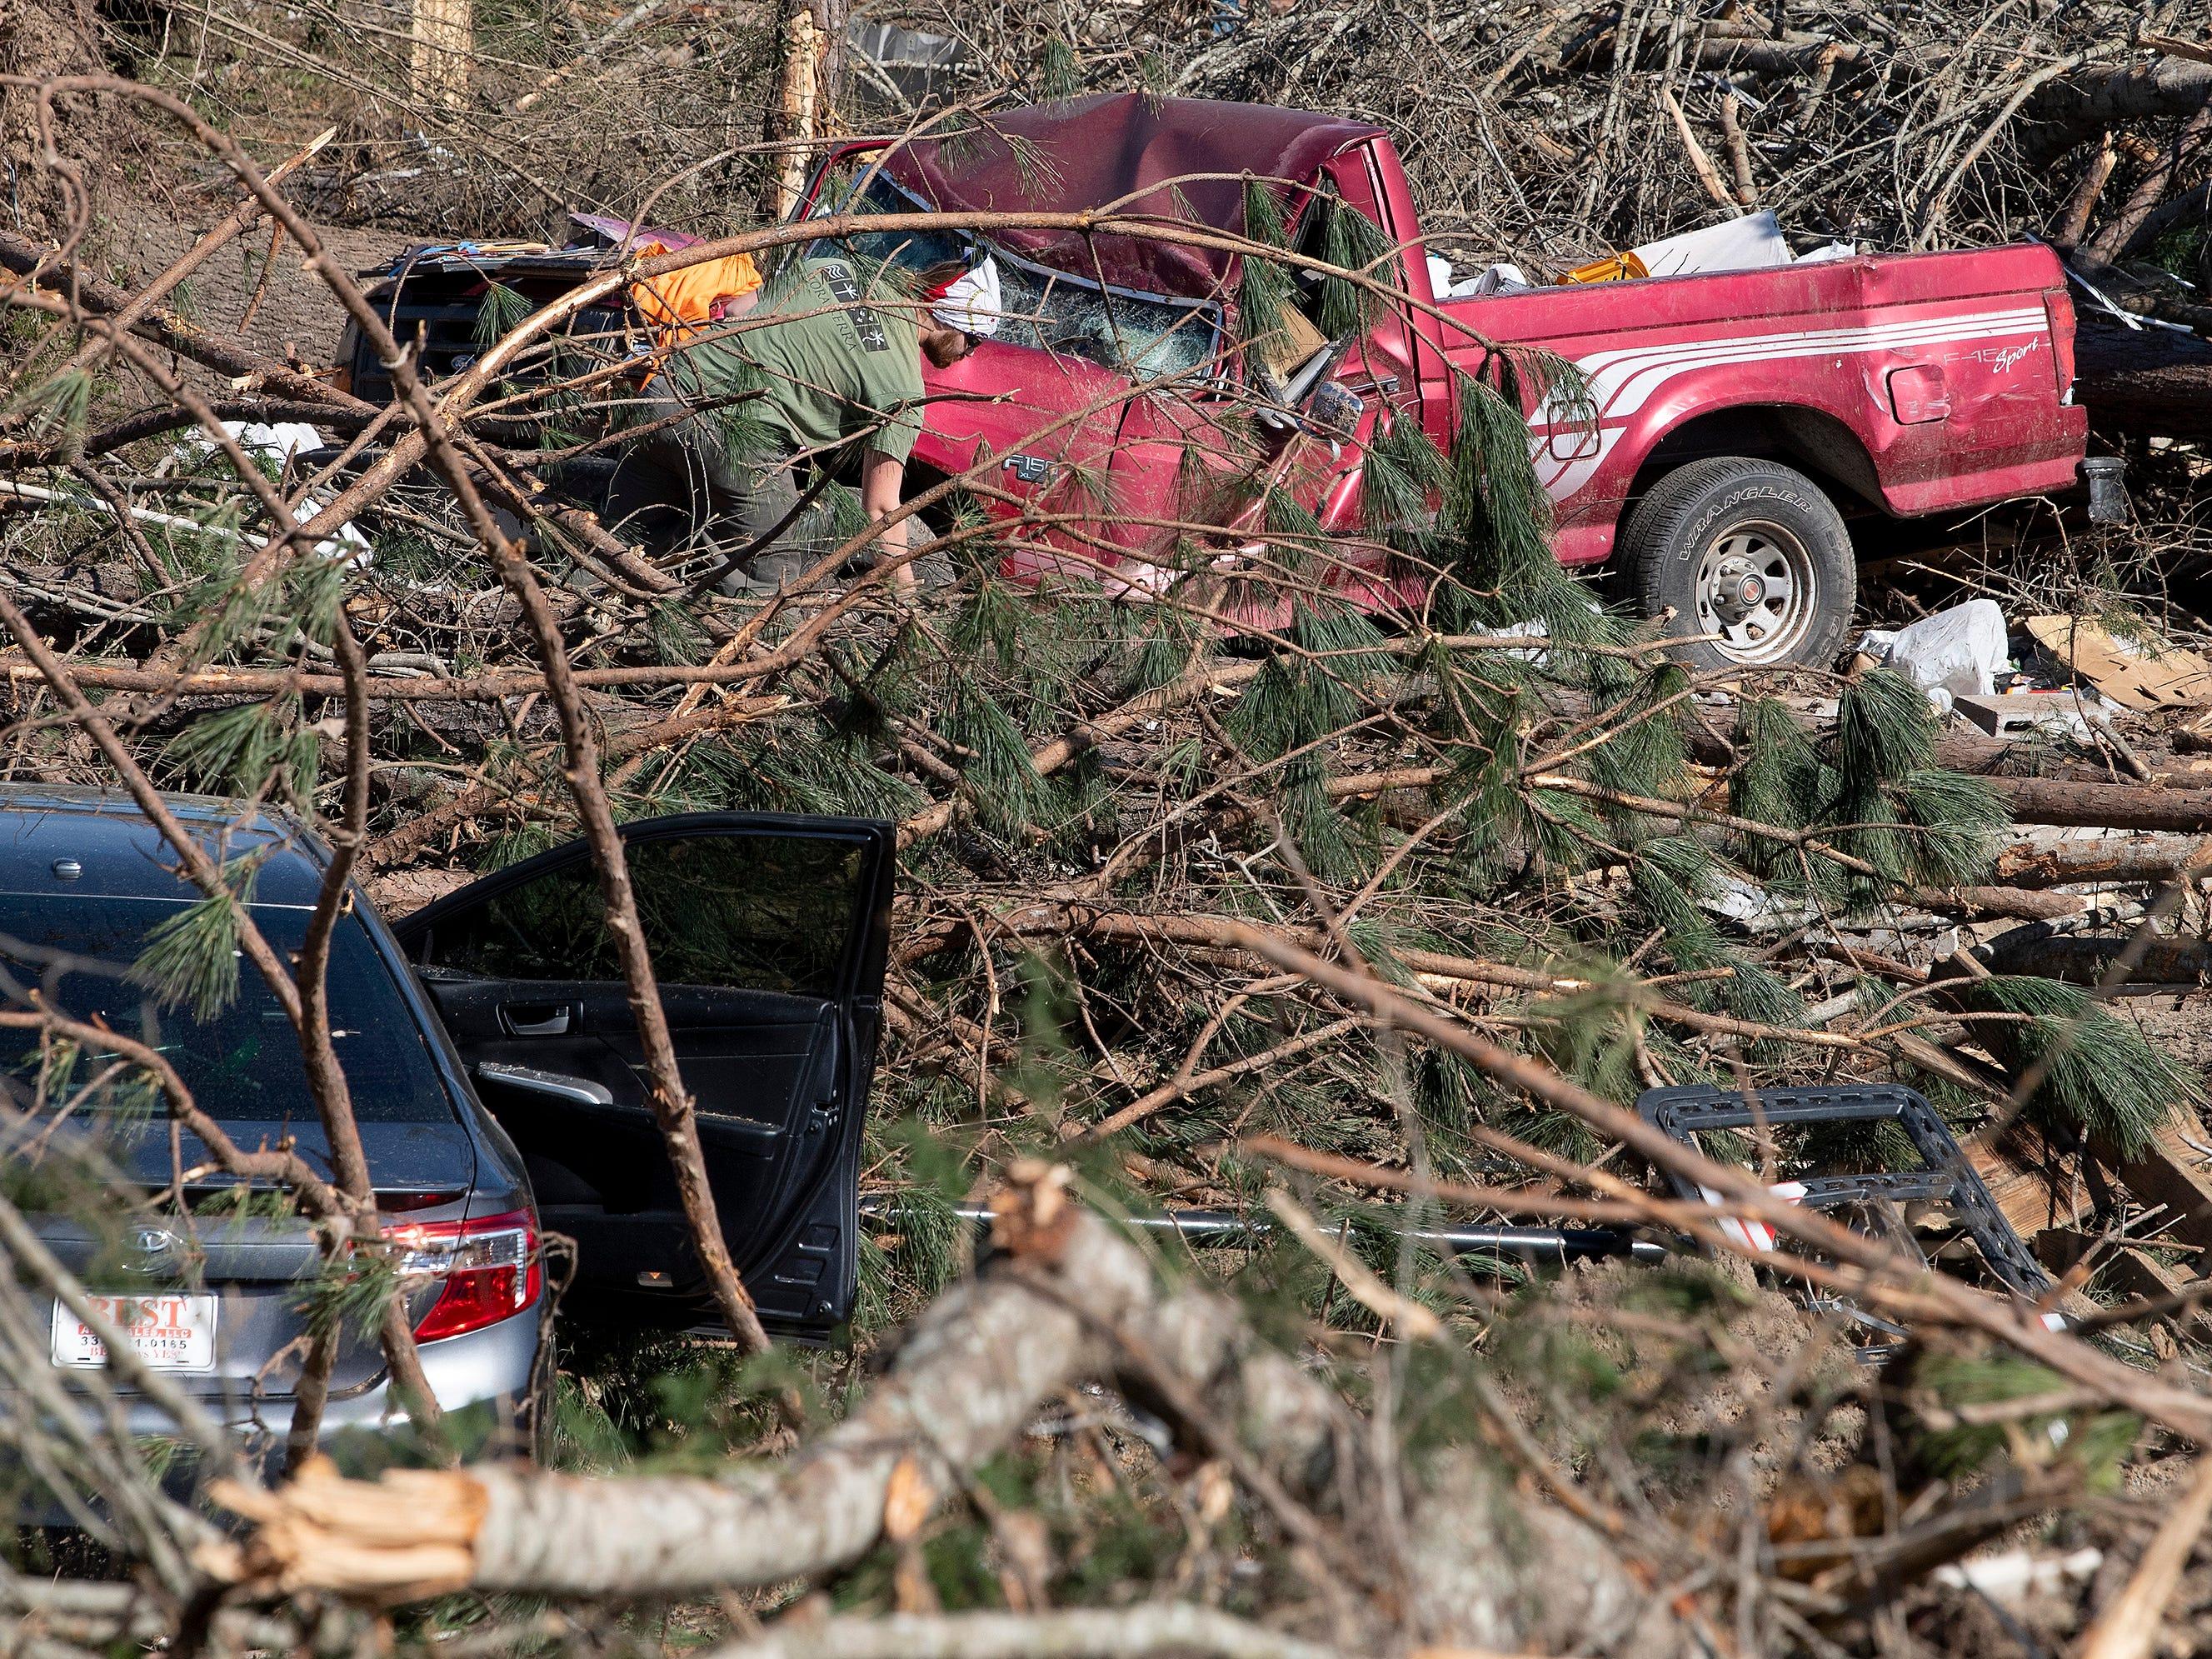 Residents clean up debris in Beauregard, Ala., on March 7, 2019.